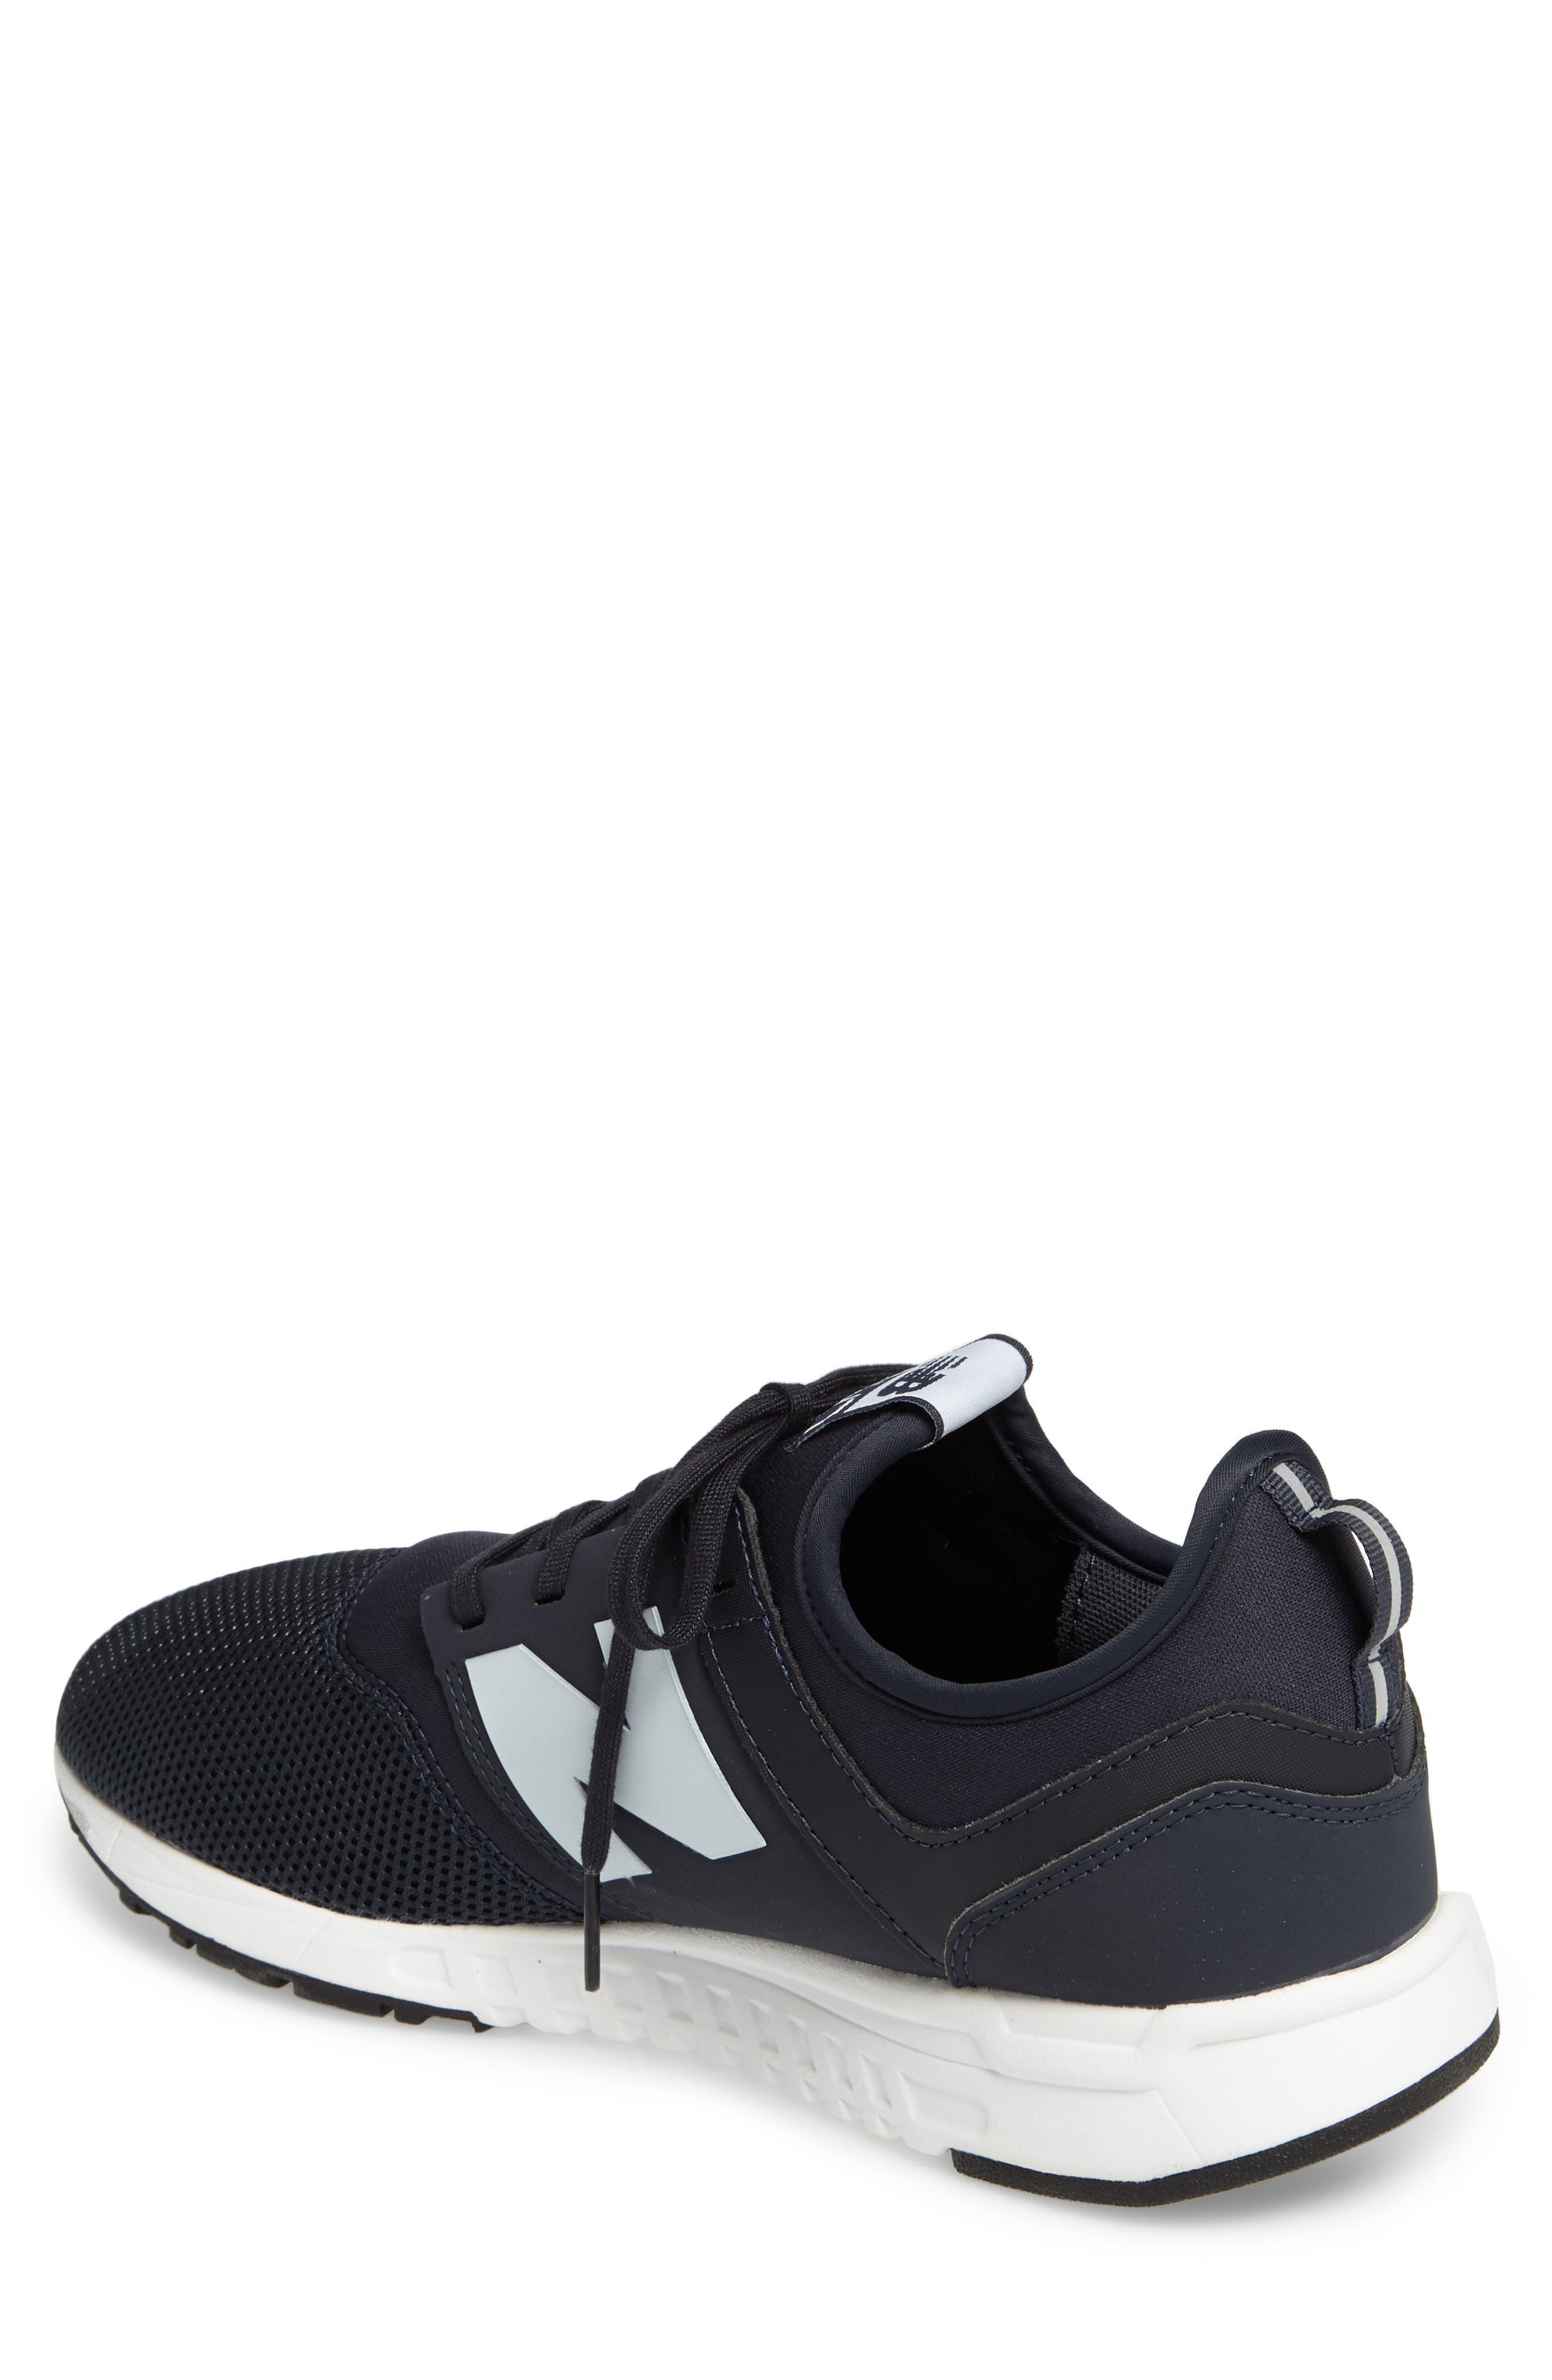 247 Modern Classic Sneaker,                             Alternate thumbnail 8, color,